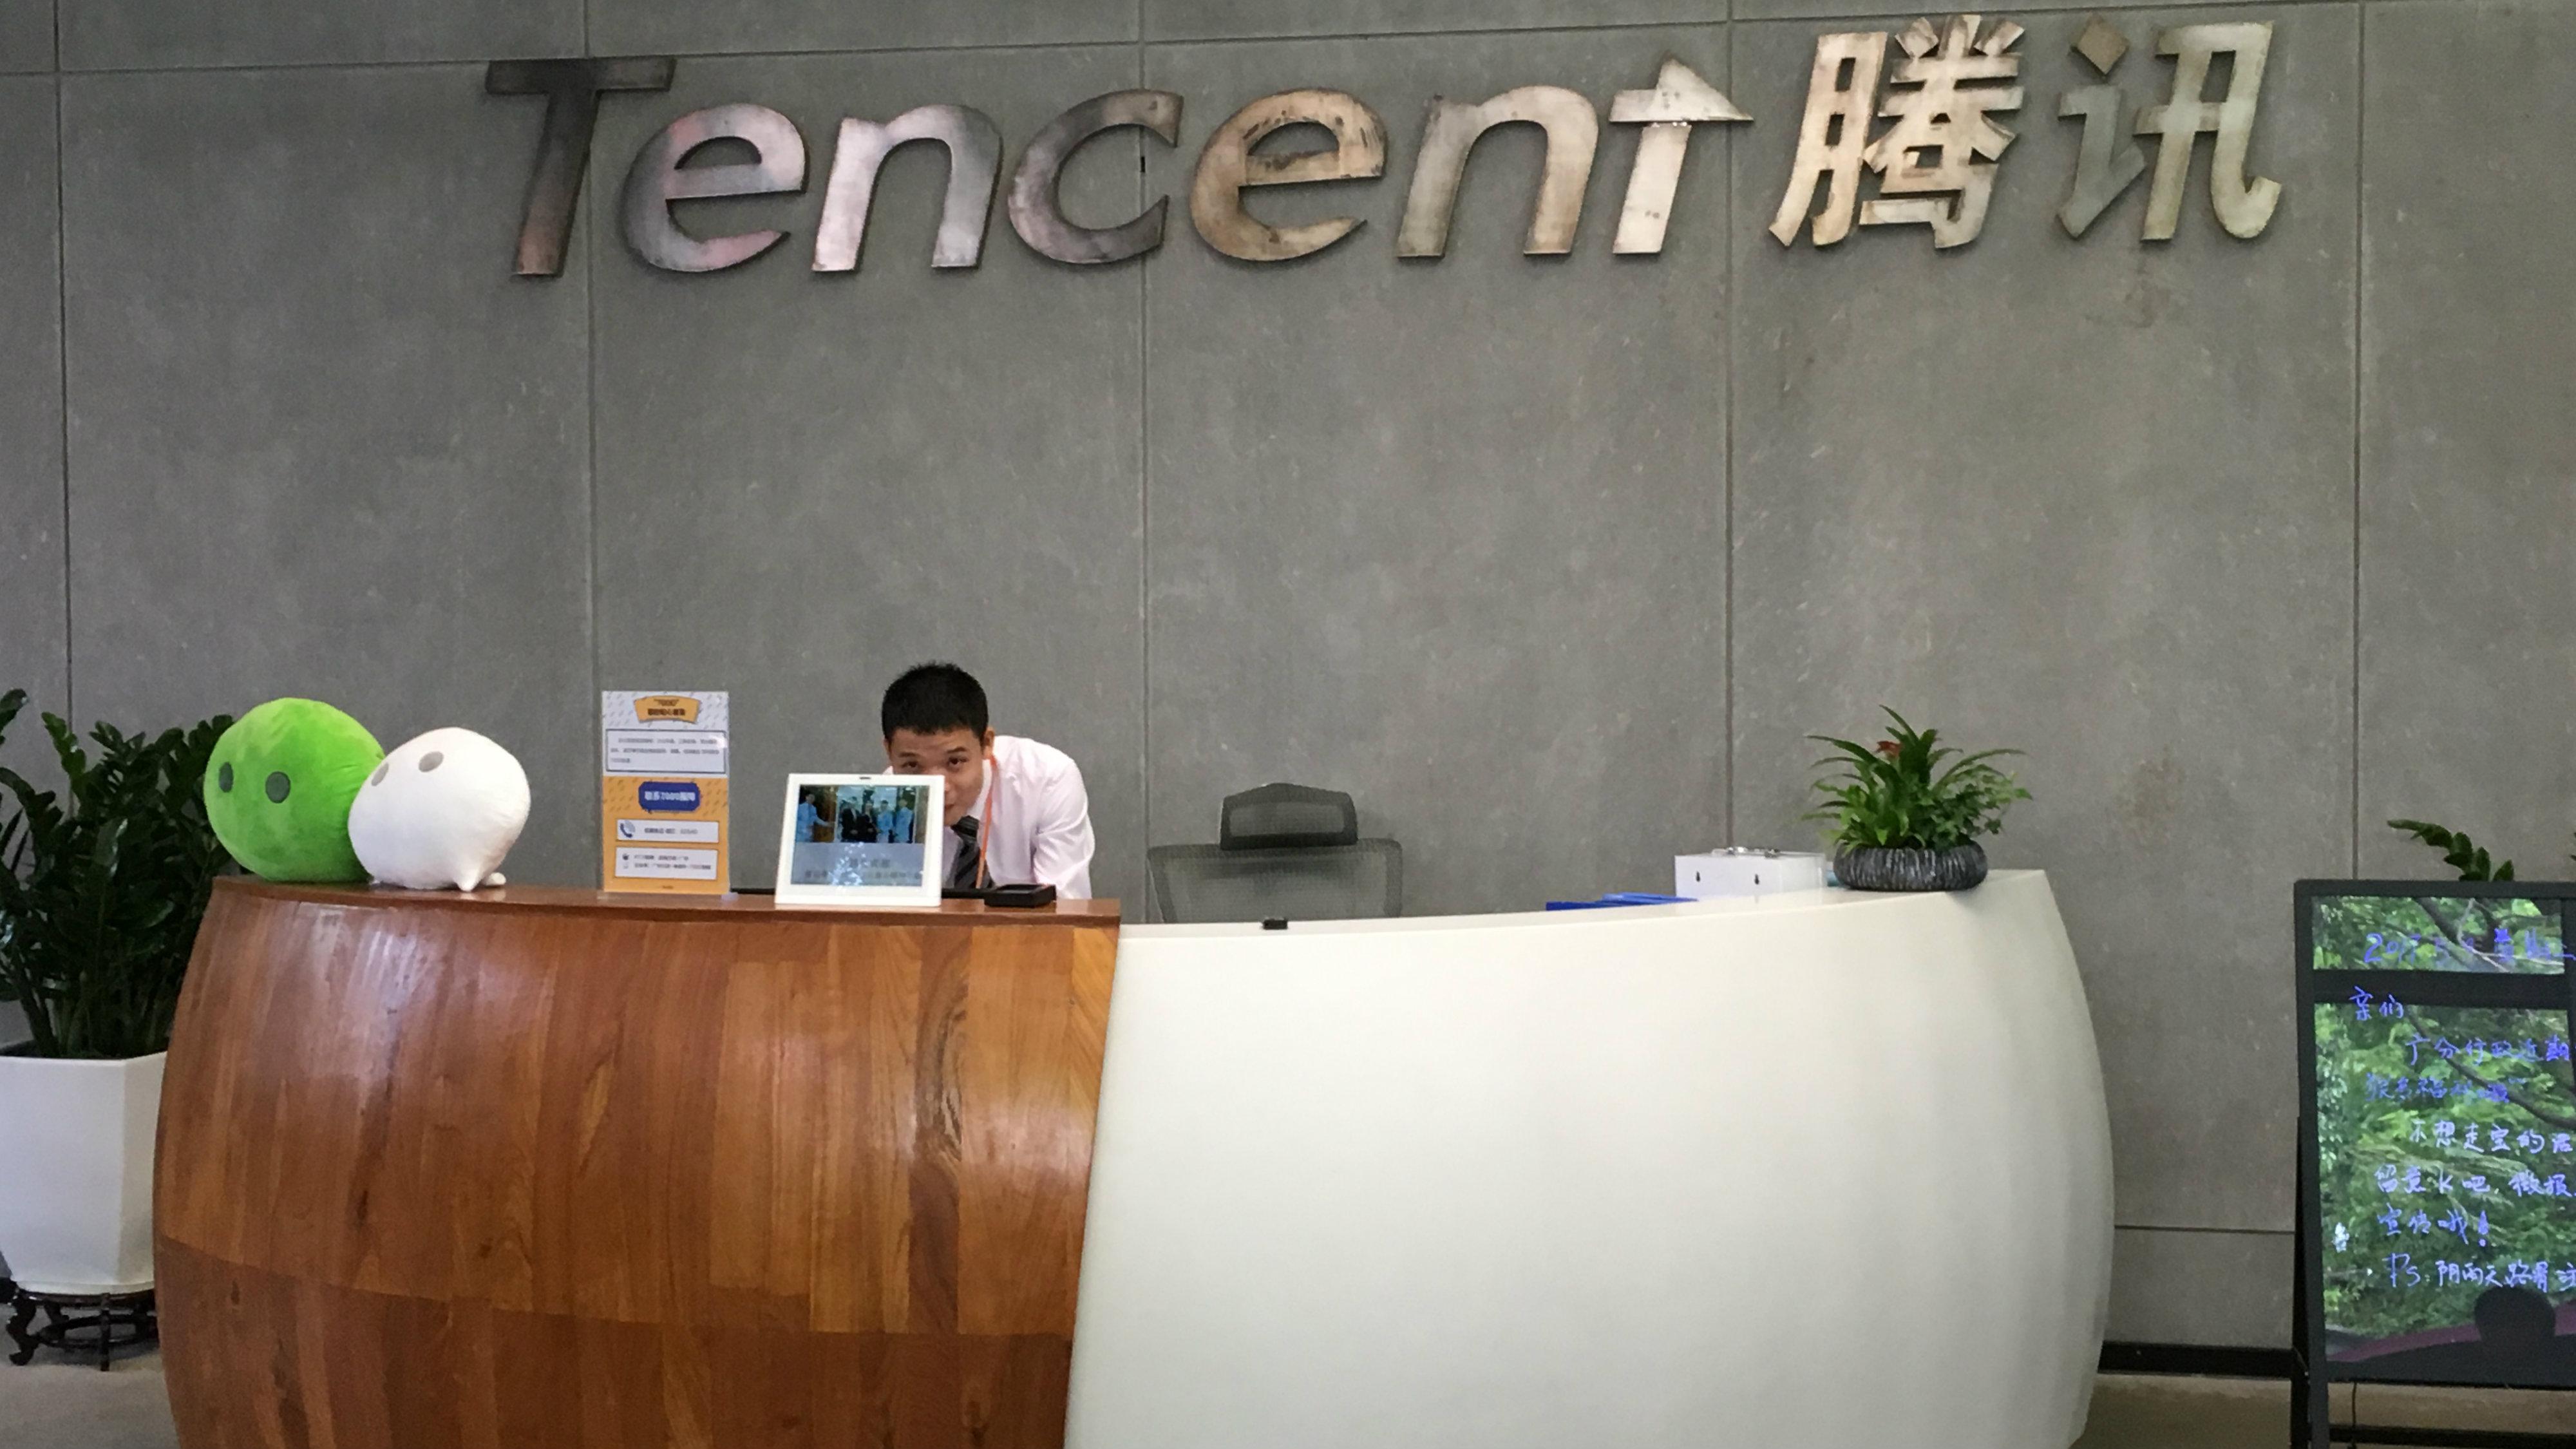 WeChat's headquarters in Guangzhou, China